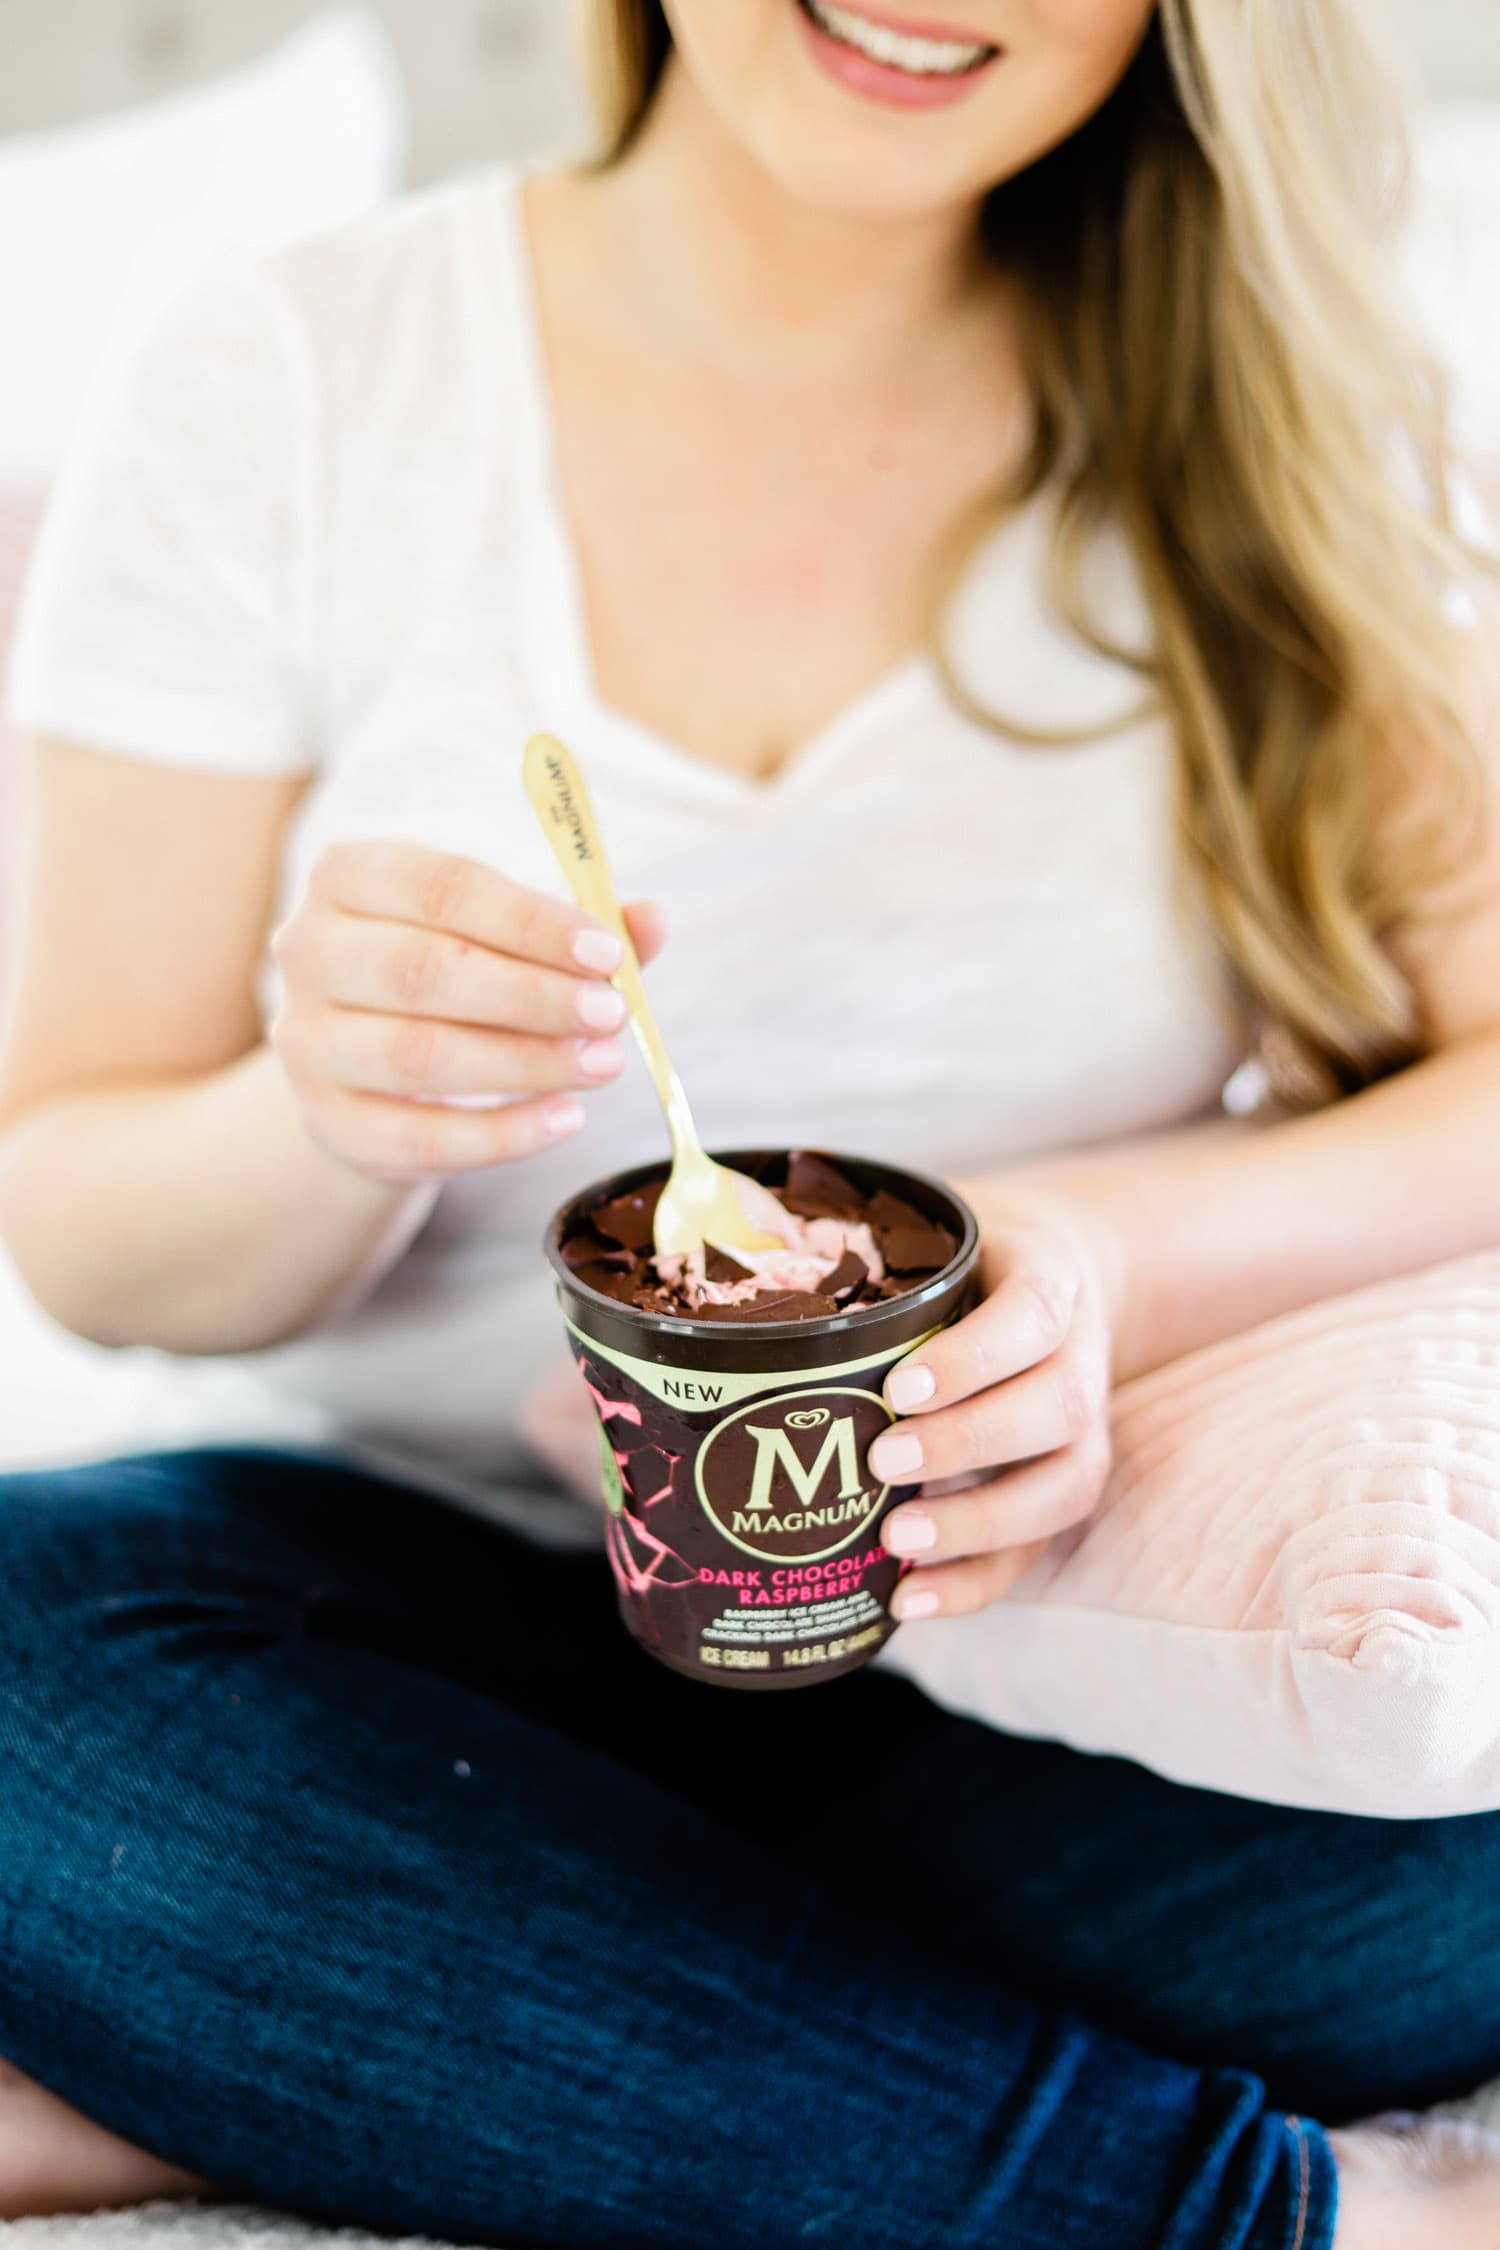 girls date, magnum ice cream, date night, ice cream, dessert, Ashley Brooke Nicholas